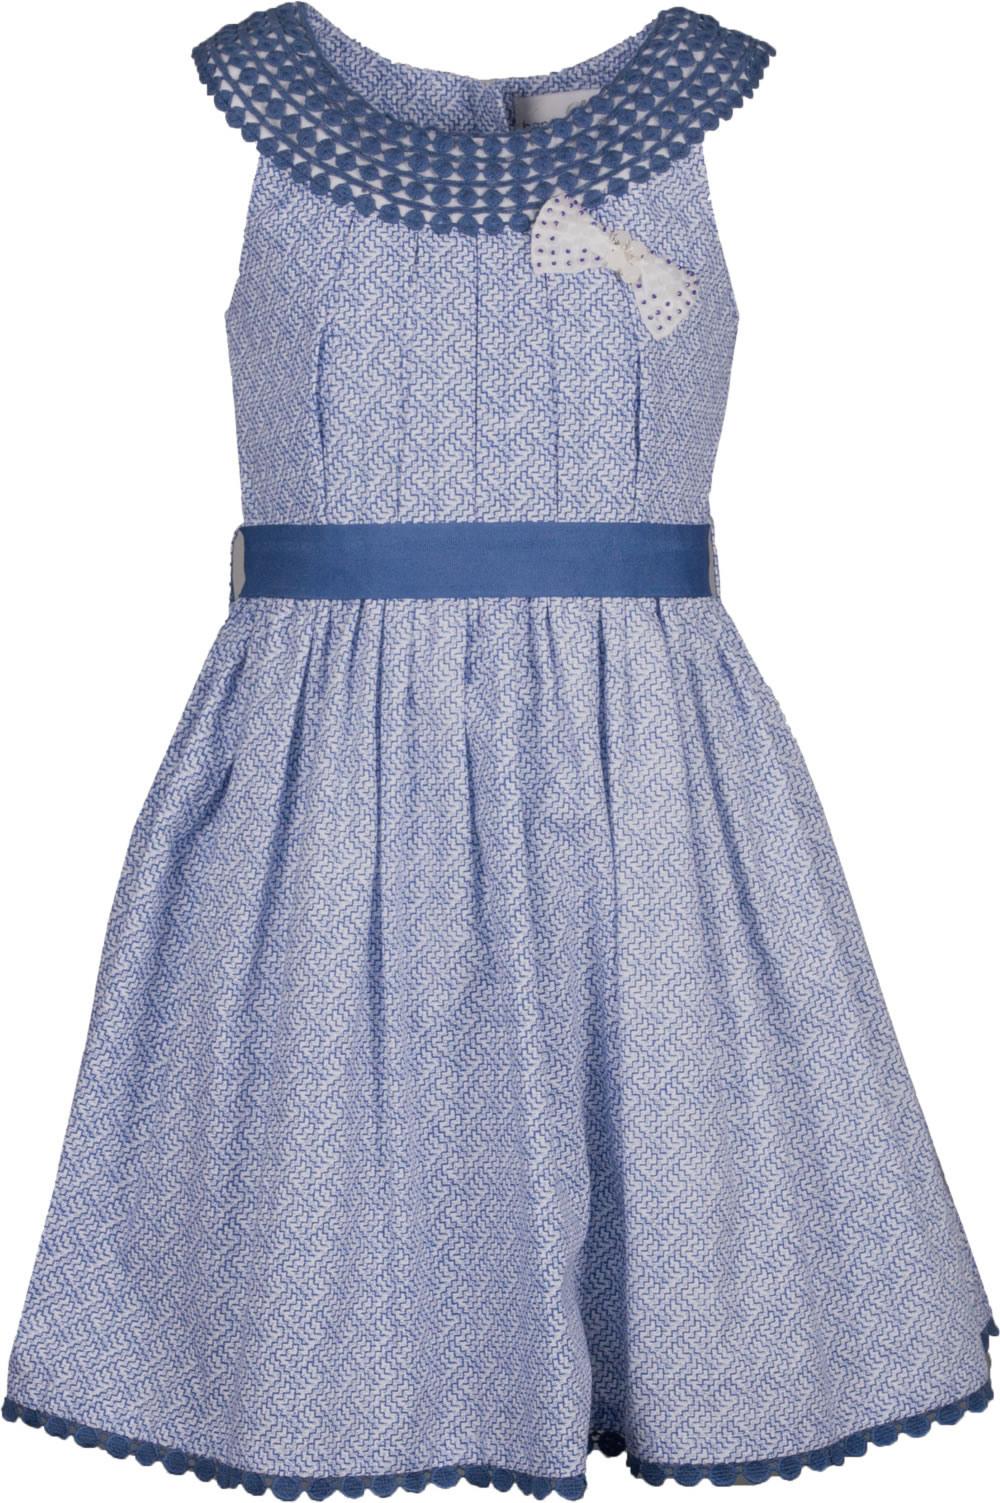 10 Elegant Royalblau Kleid Spezialgebiet Schön Royalblau Kleid Galerie